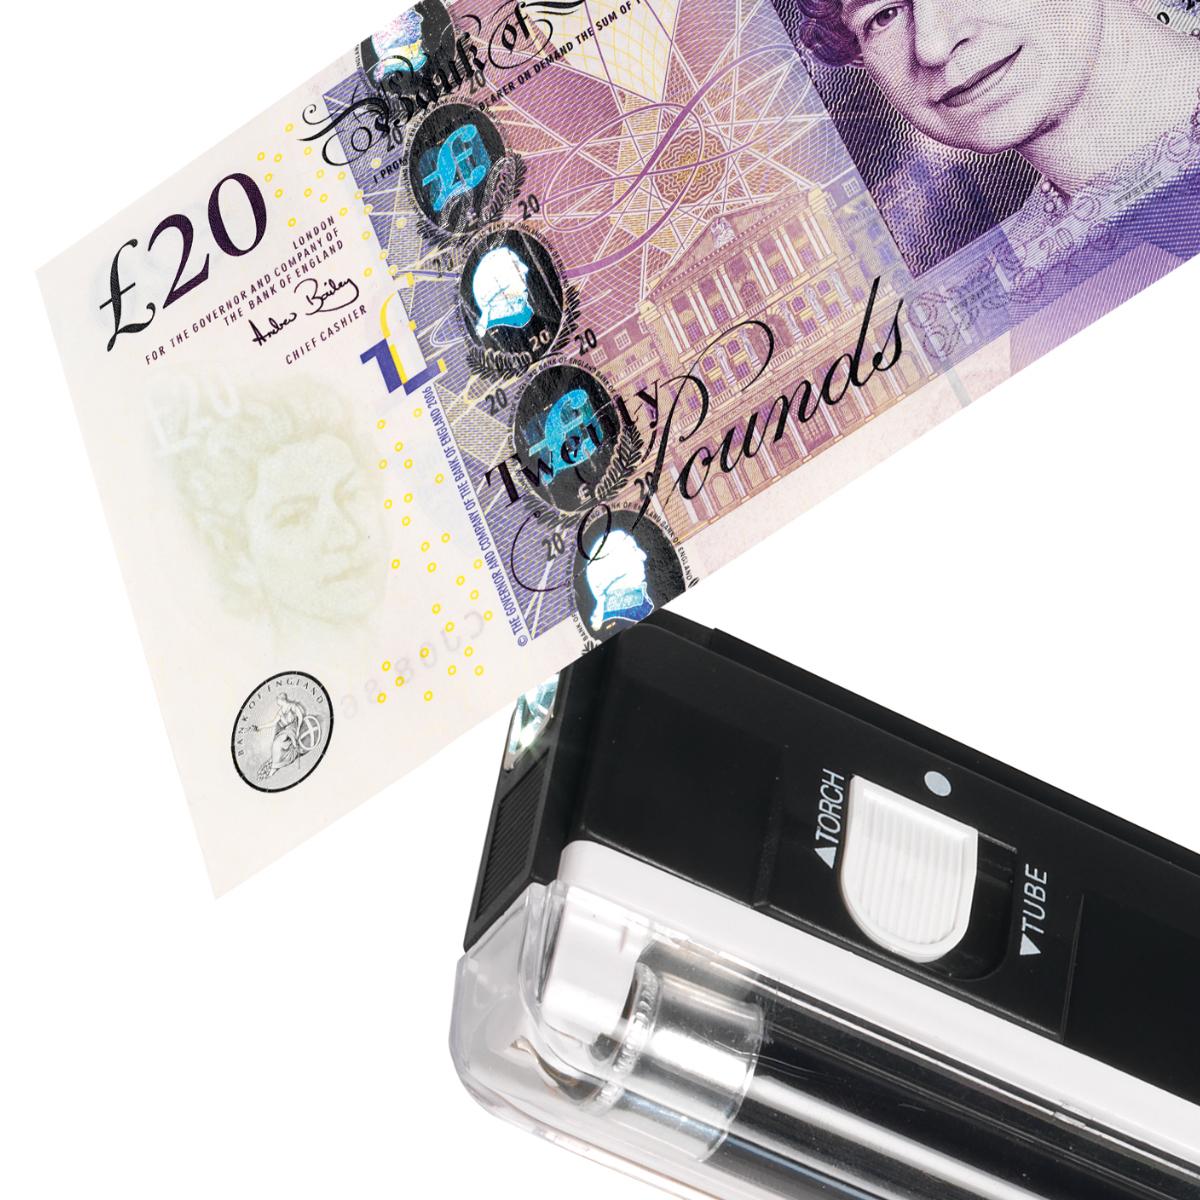 Safescan 40H UV Detector Note Checker Handheld 4W UV & LED Torch L160xW560x220mm Black Ref 130-0444